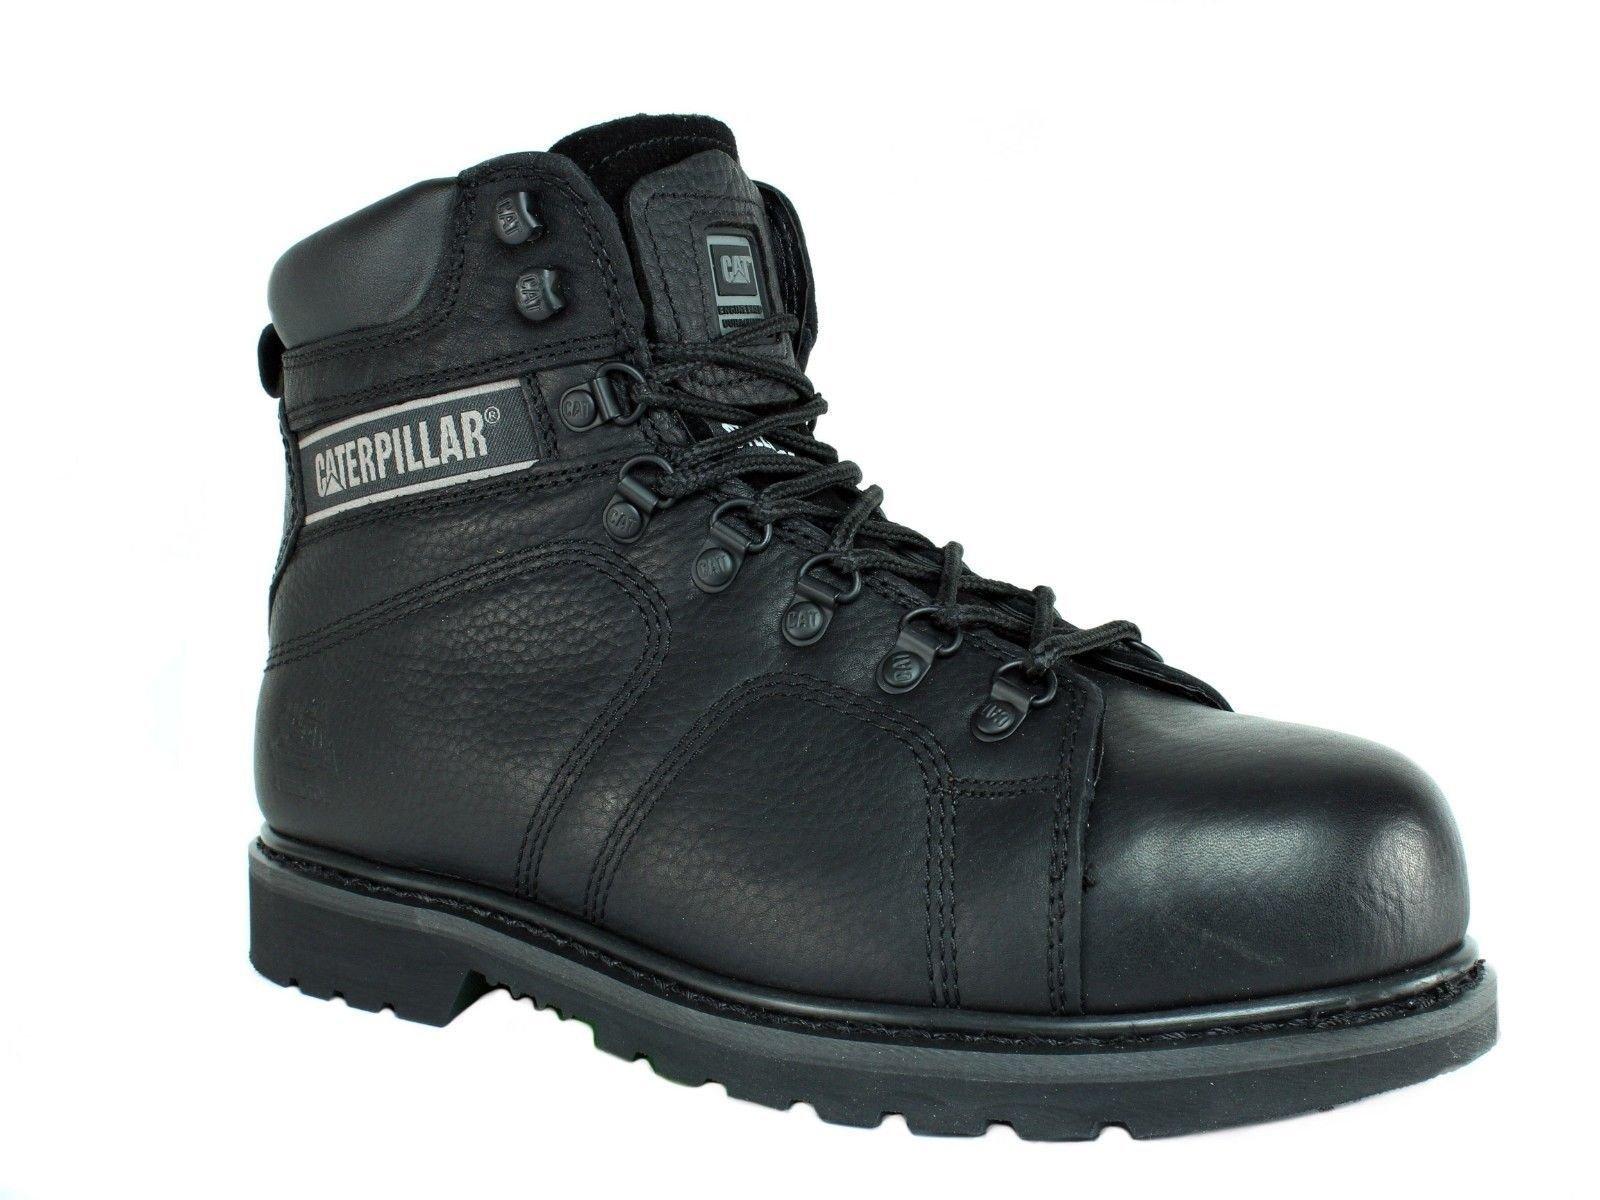 Caterpillar SureGrip Mens Silverton SG Black Slip Resistant Work Boots 12M by Caterpillar (Image #1)